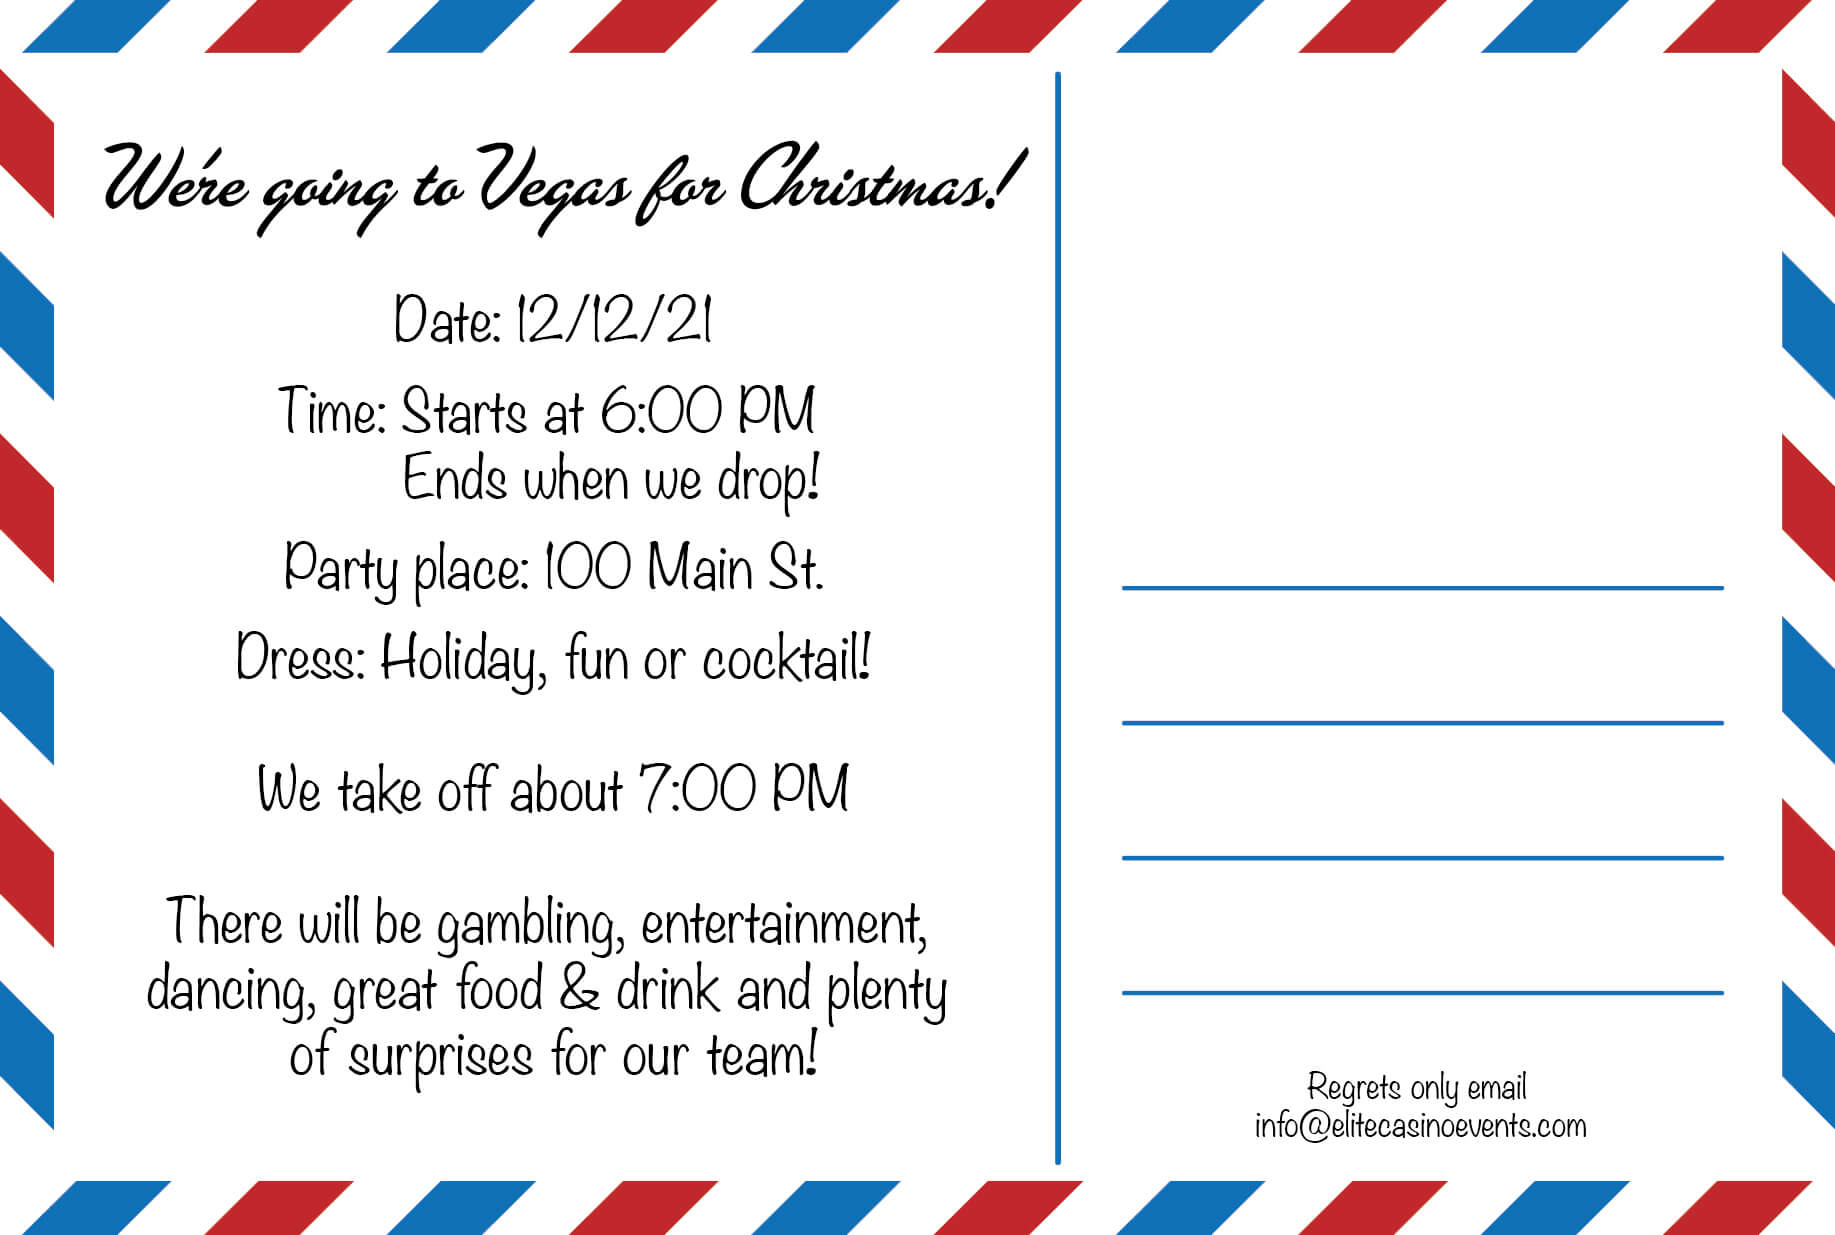 Las Vegas Postcard Invitation